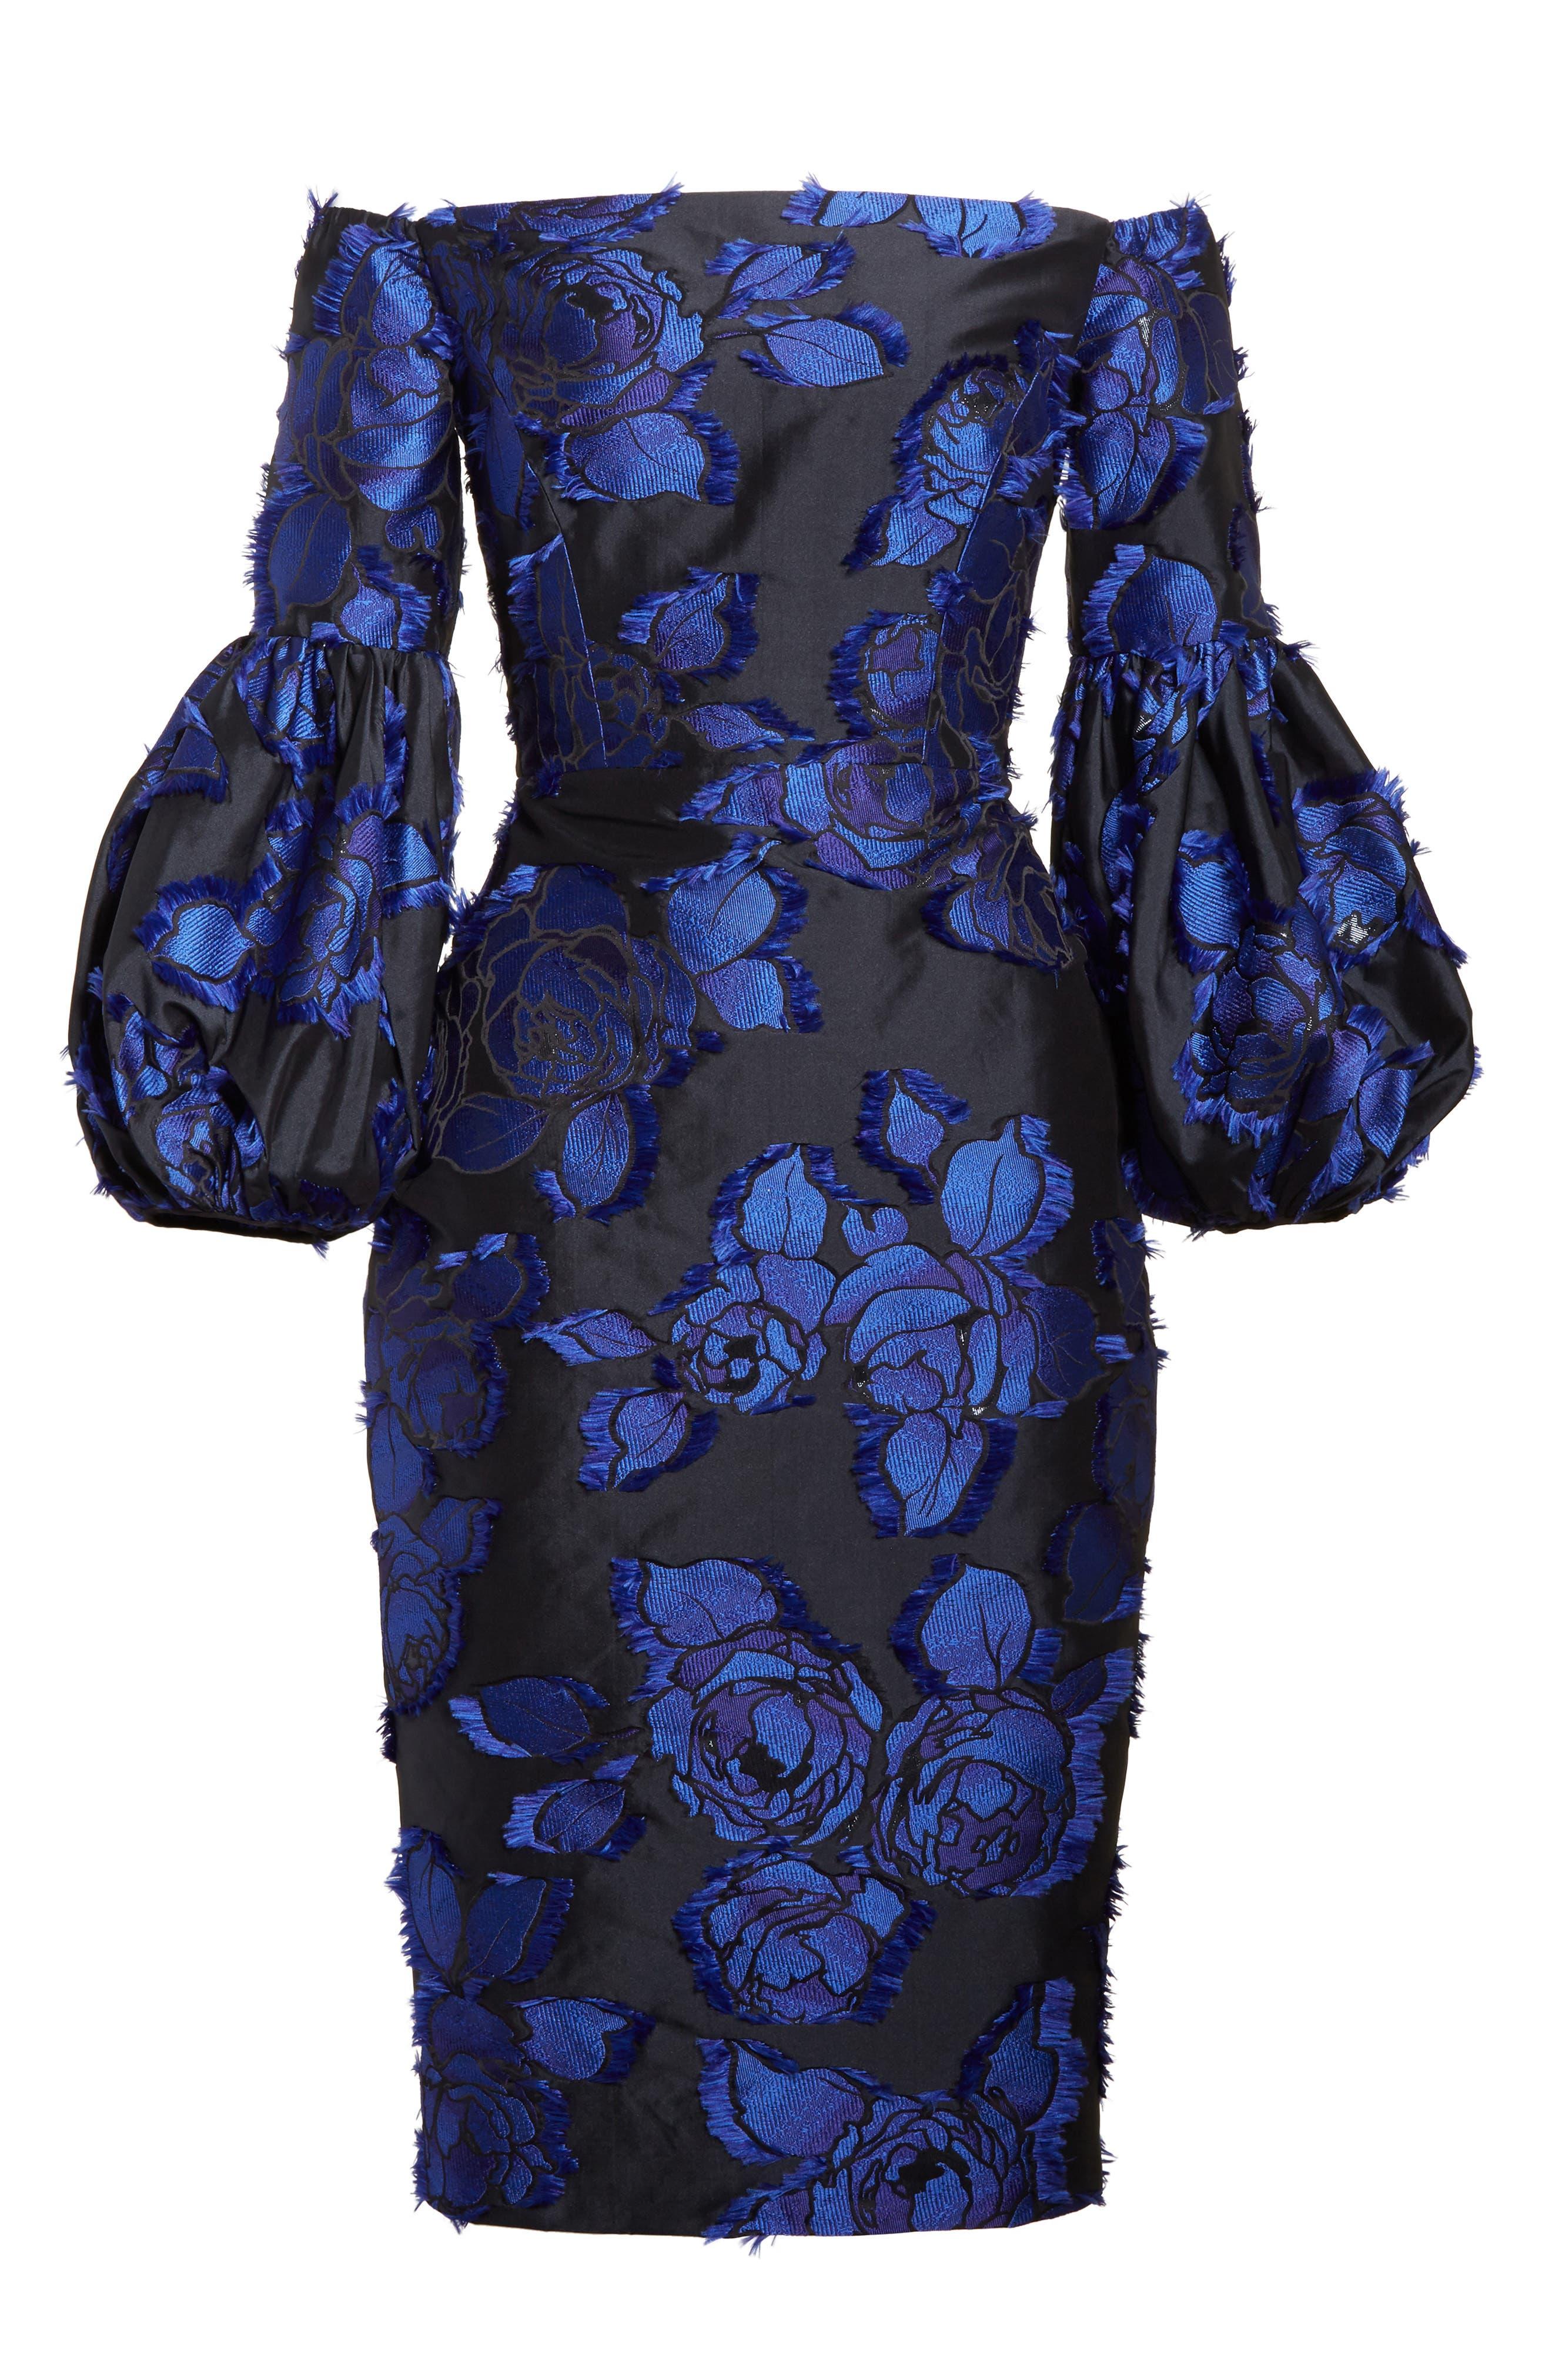 Fring Brocade Puff Sleeve Dress,                             Alternate thumbnail 4, color,                             Black/ Lapis